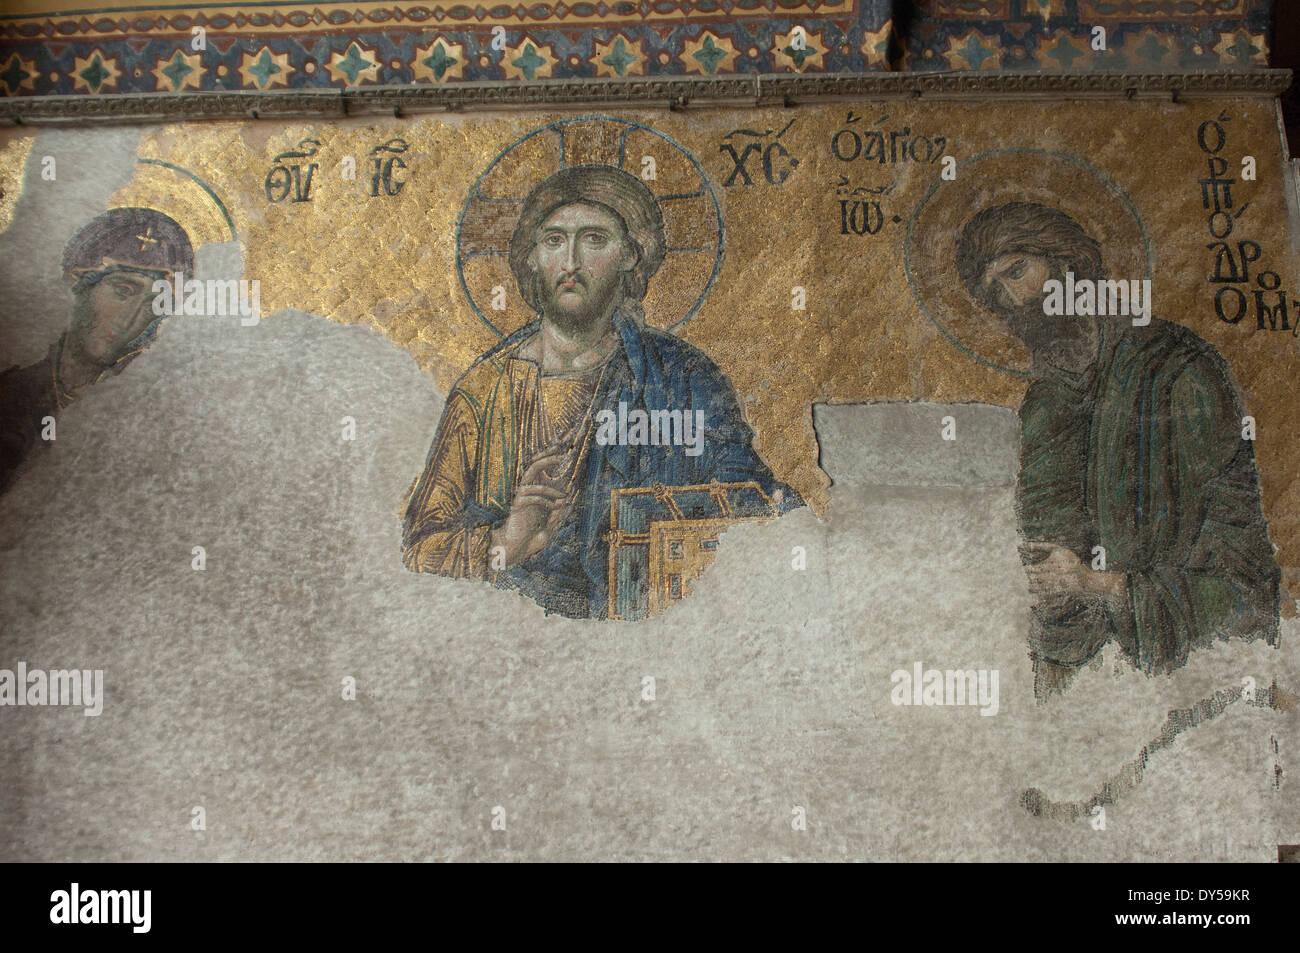 Byzantine mosaic of Jesus in the Hagia Sophia, Istanbul. Digital photograph Stock Photo